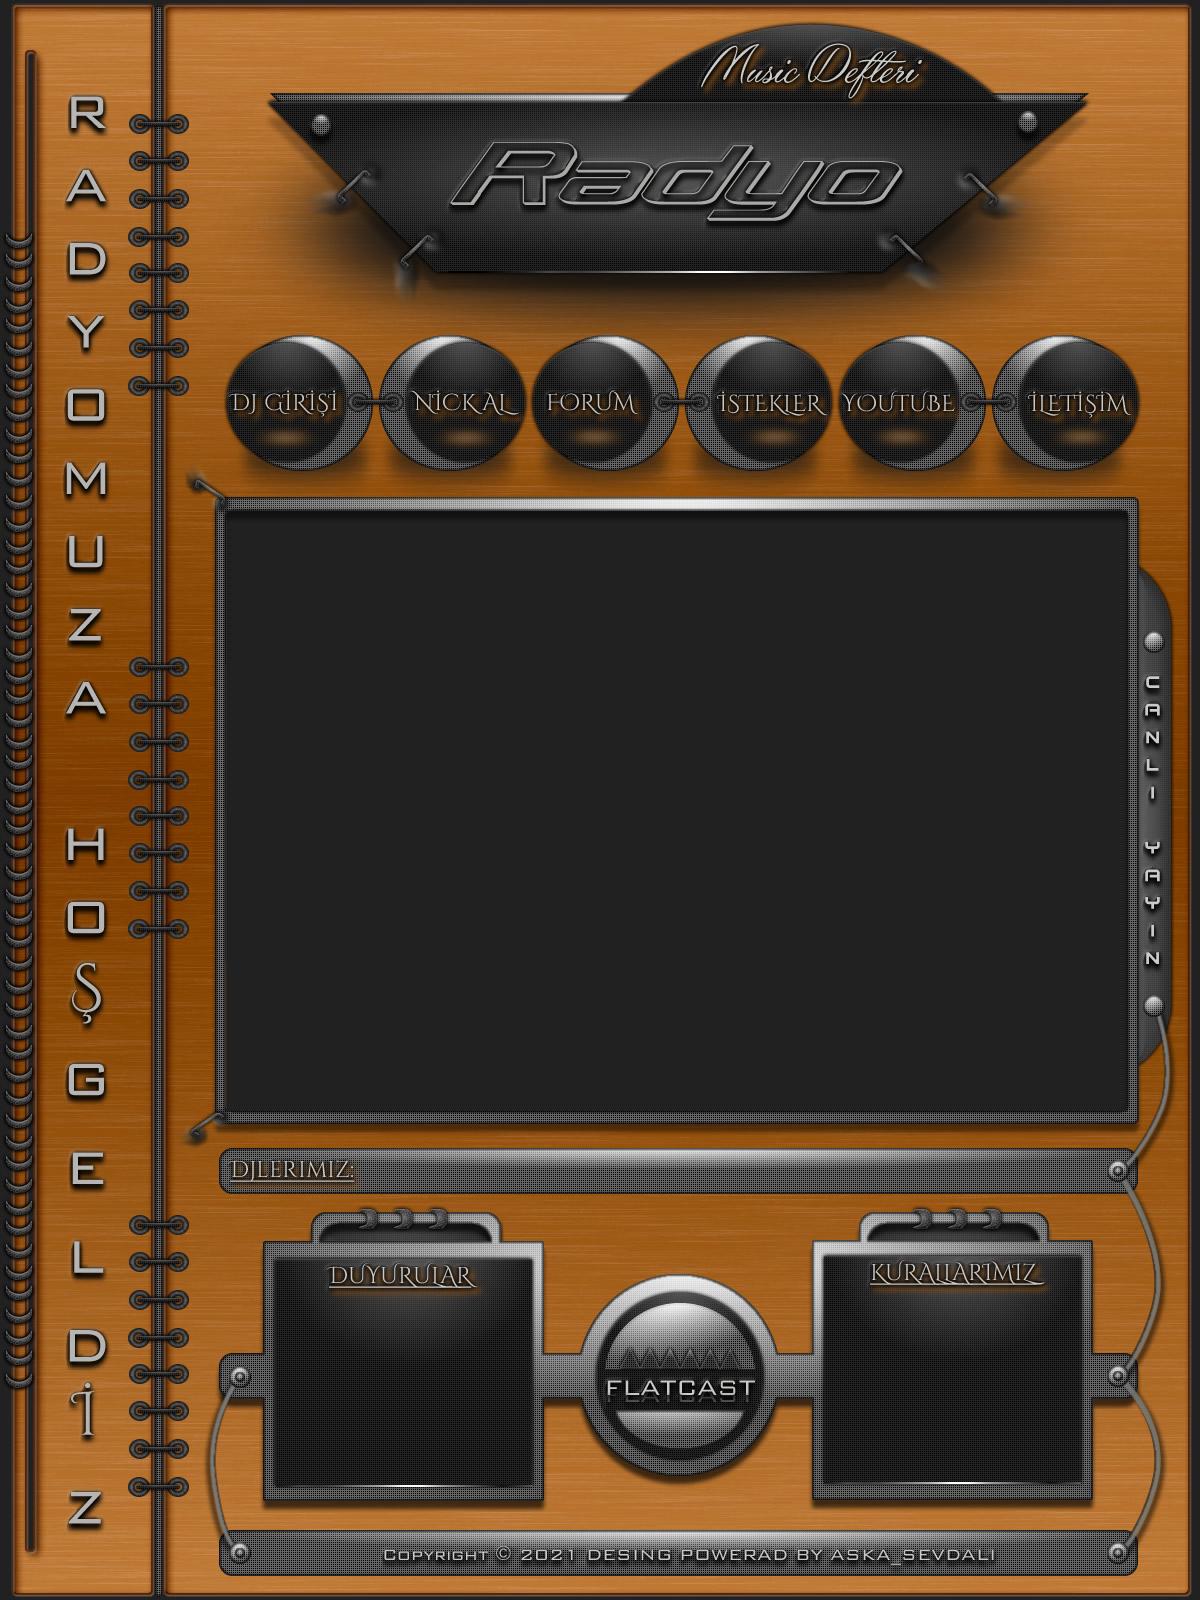 Müzik Defteri Flatcast Radyo index By Aska_SevDaLi